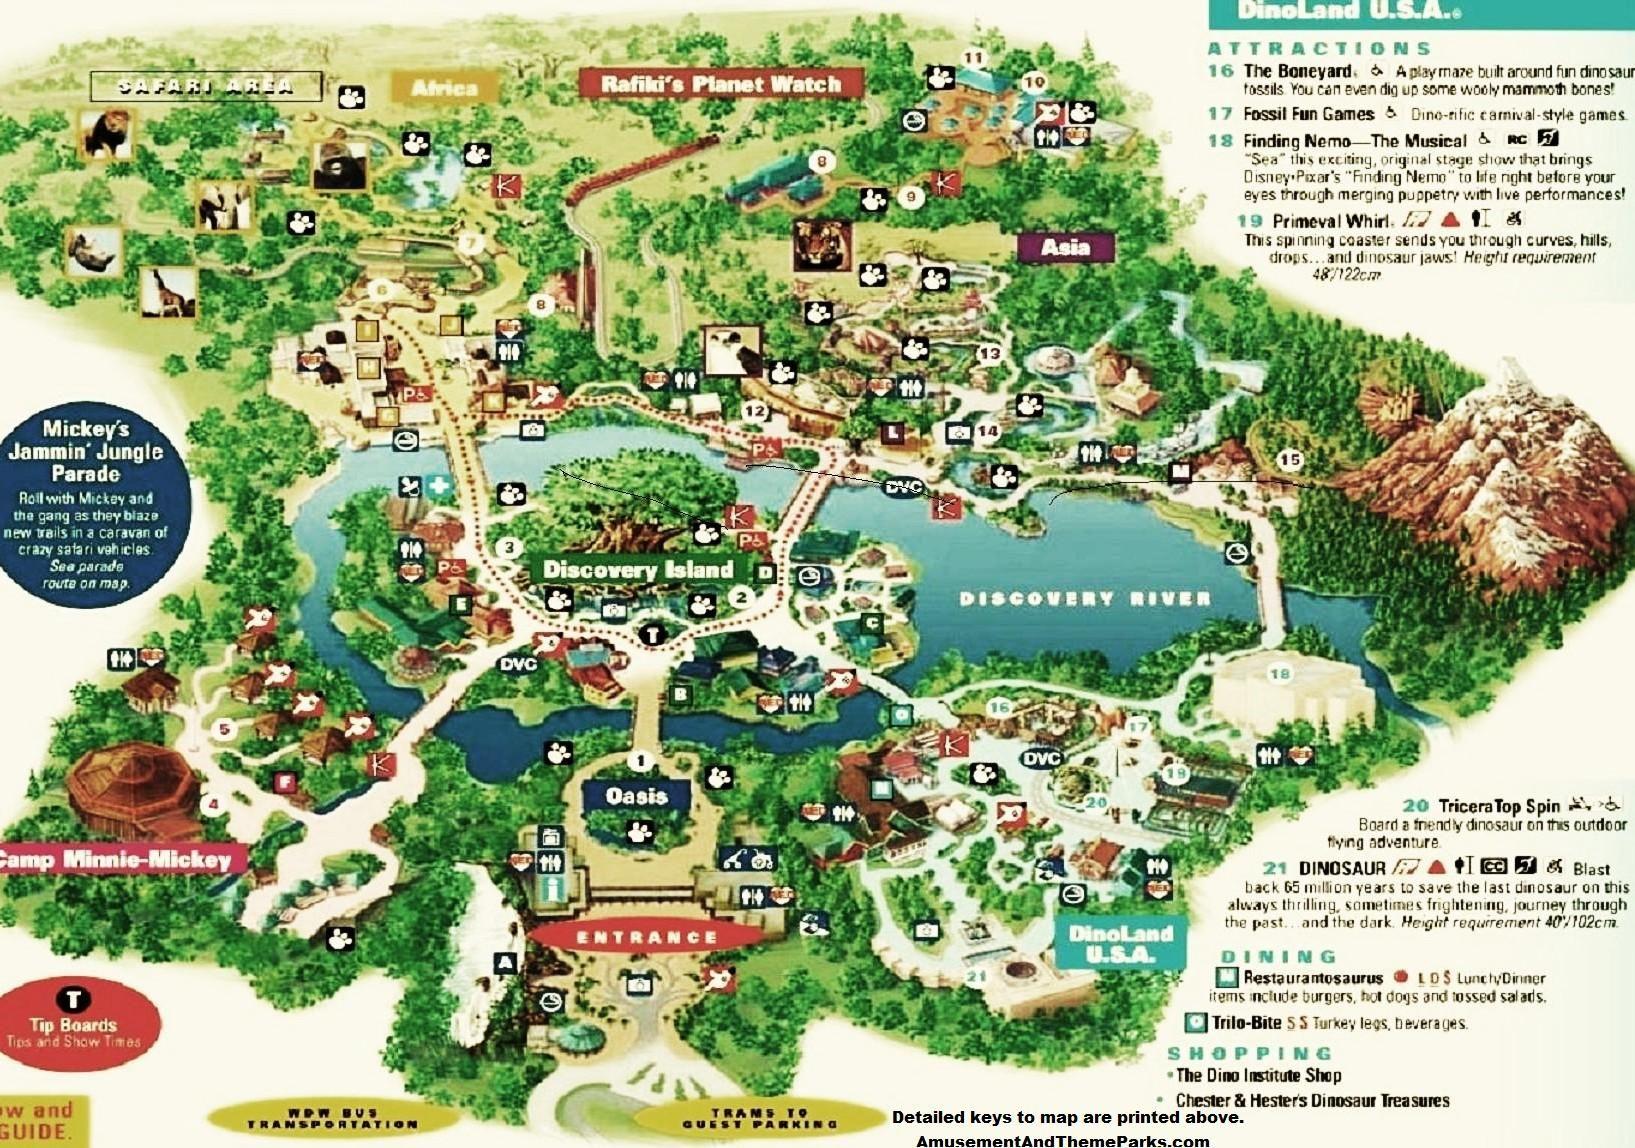 Animal Kingdom Map – Please See Large Print Maps And Keys Below For - Animal Kingdom Florida Map